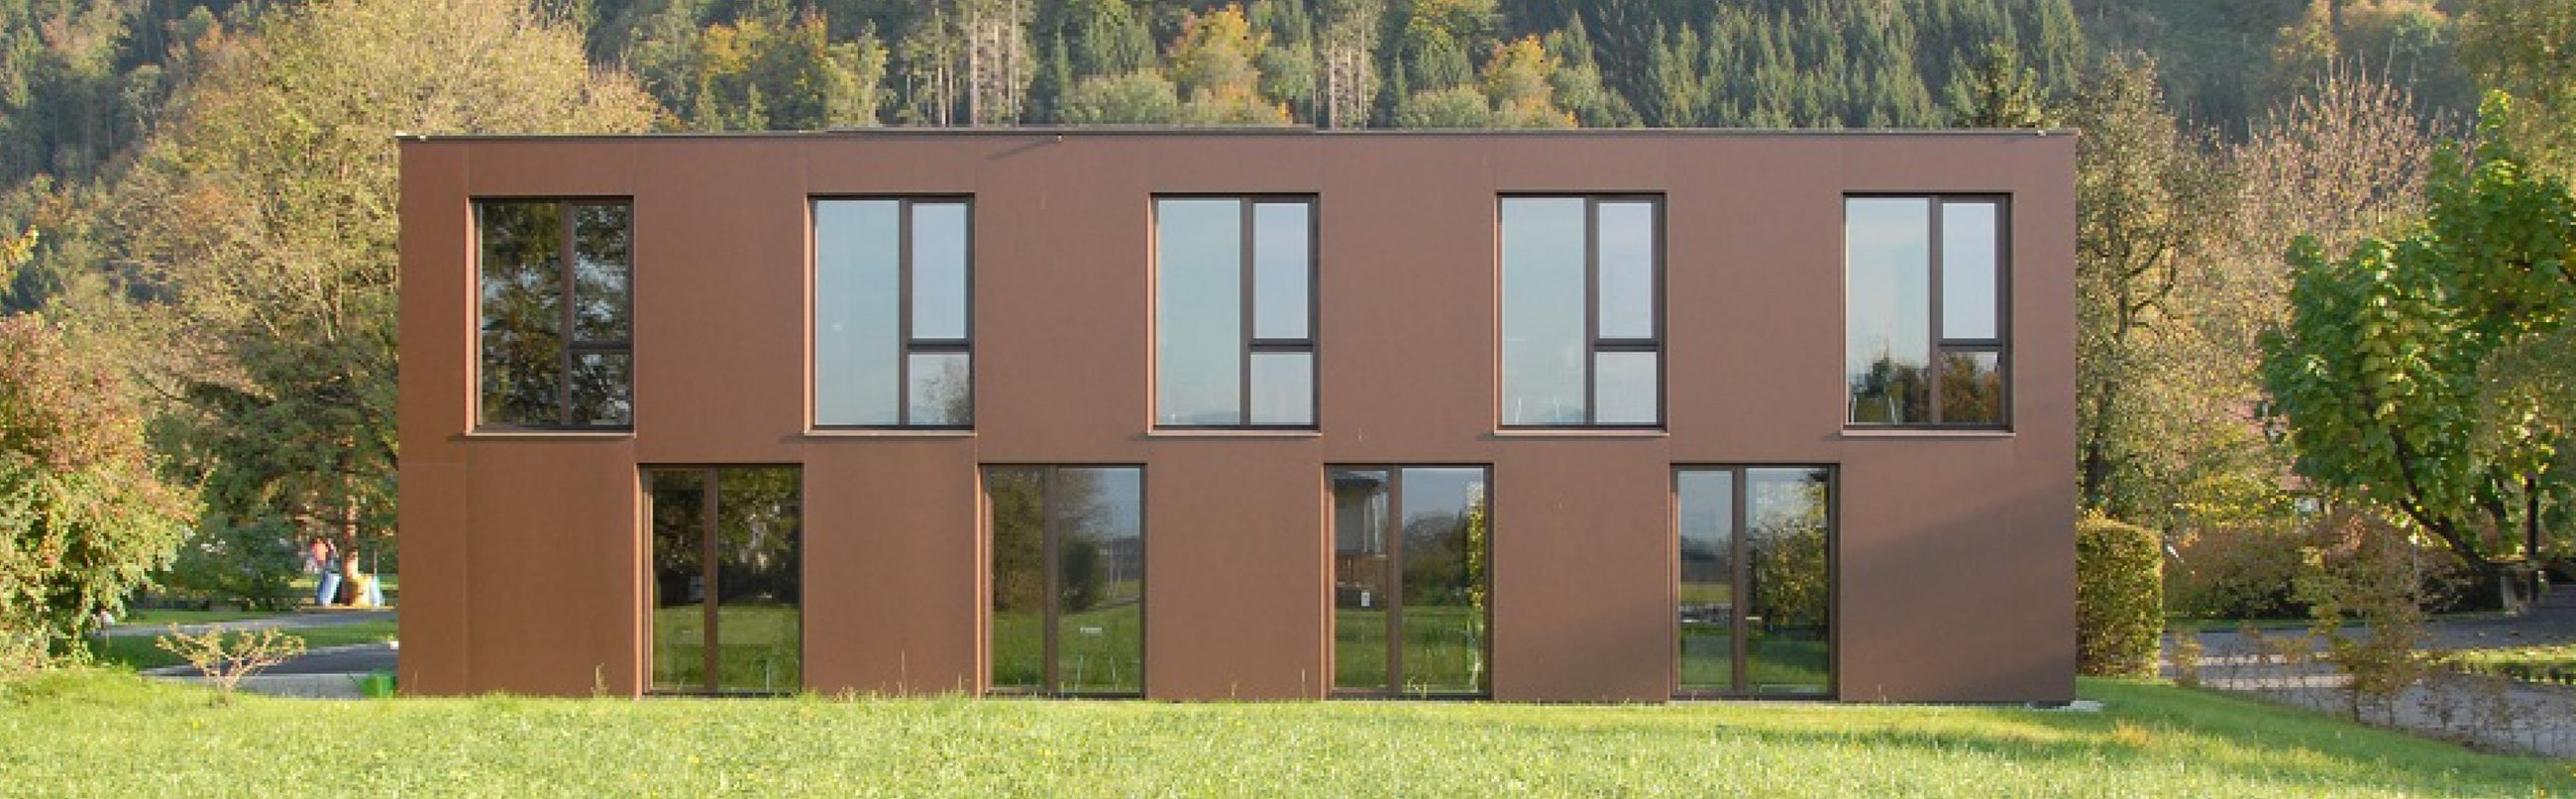 Atelier drexel architekten, Hohenems, 2006-2007